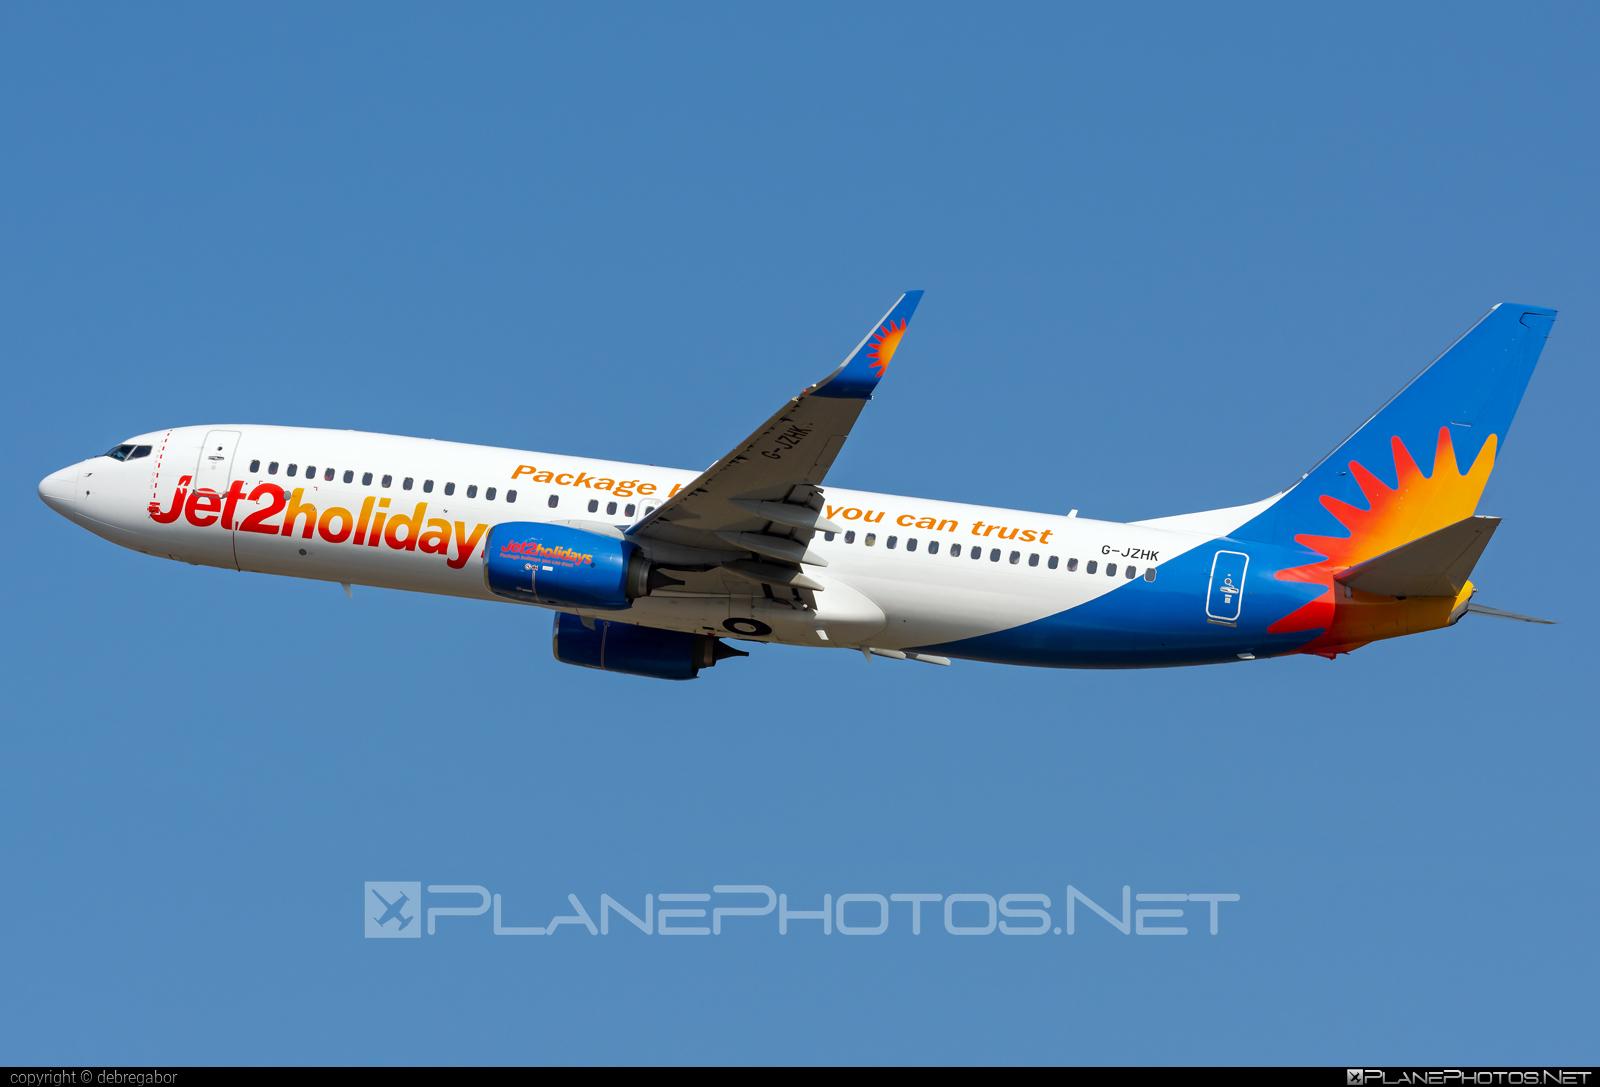 Boeing 737-800 - G-JZHK operated by Jet2 #b737 #b737nextgen #b737ng #boeing #boeing737 #jet2